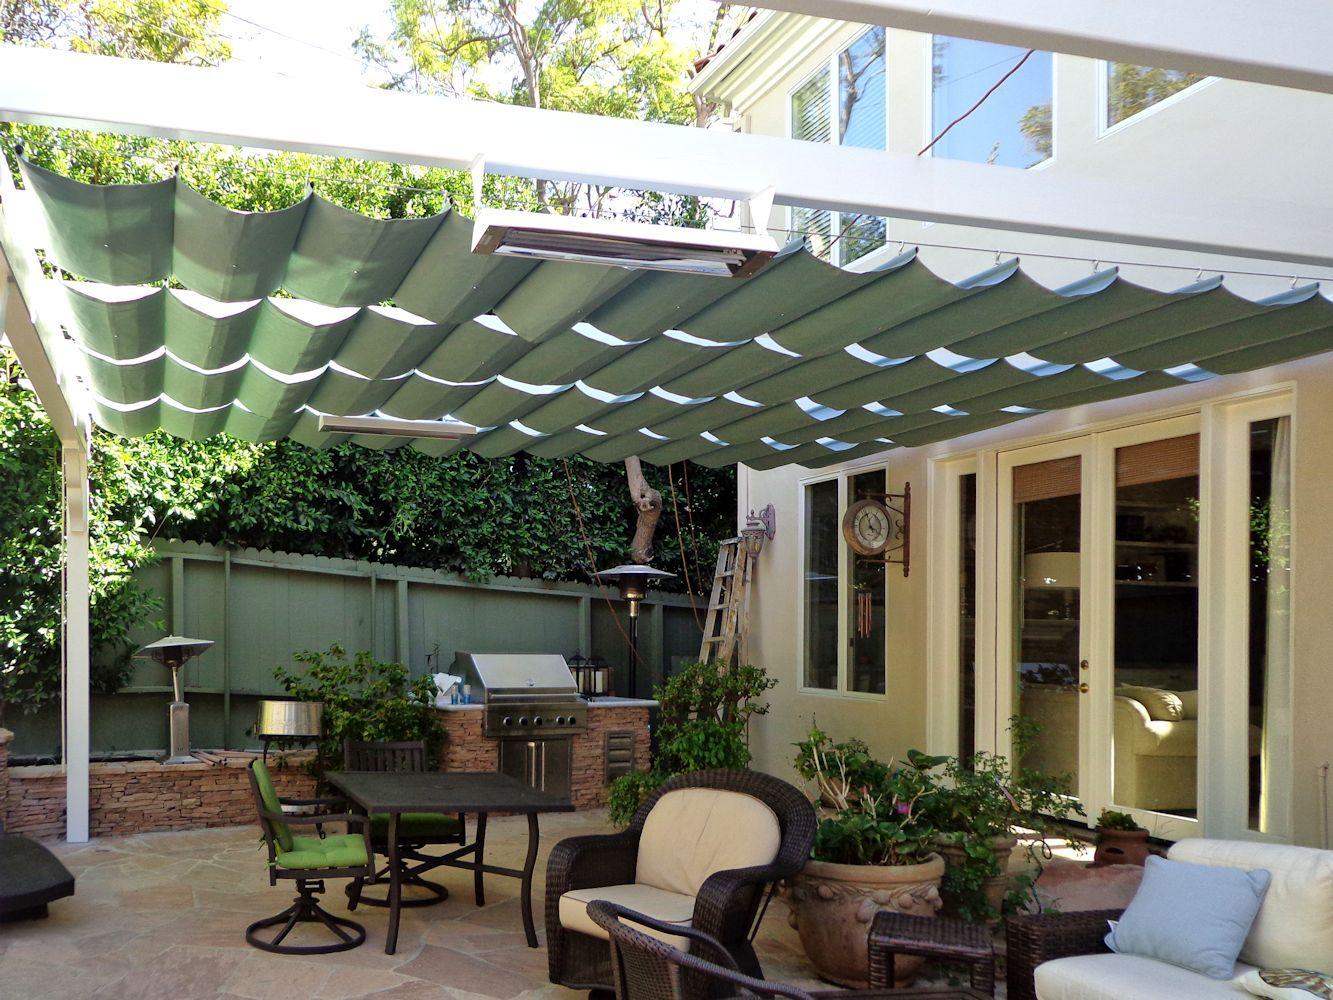 slide wire canopy outdoor living u0026 garden ideas pinterest